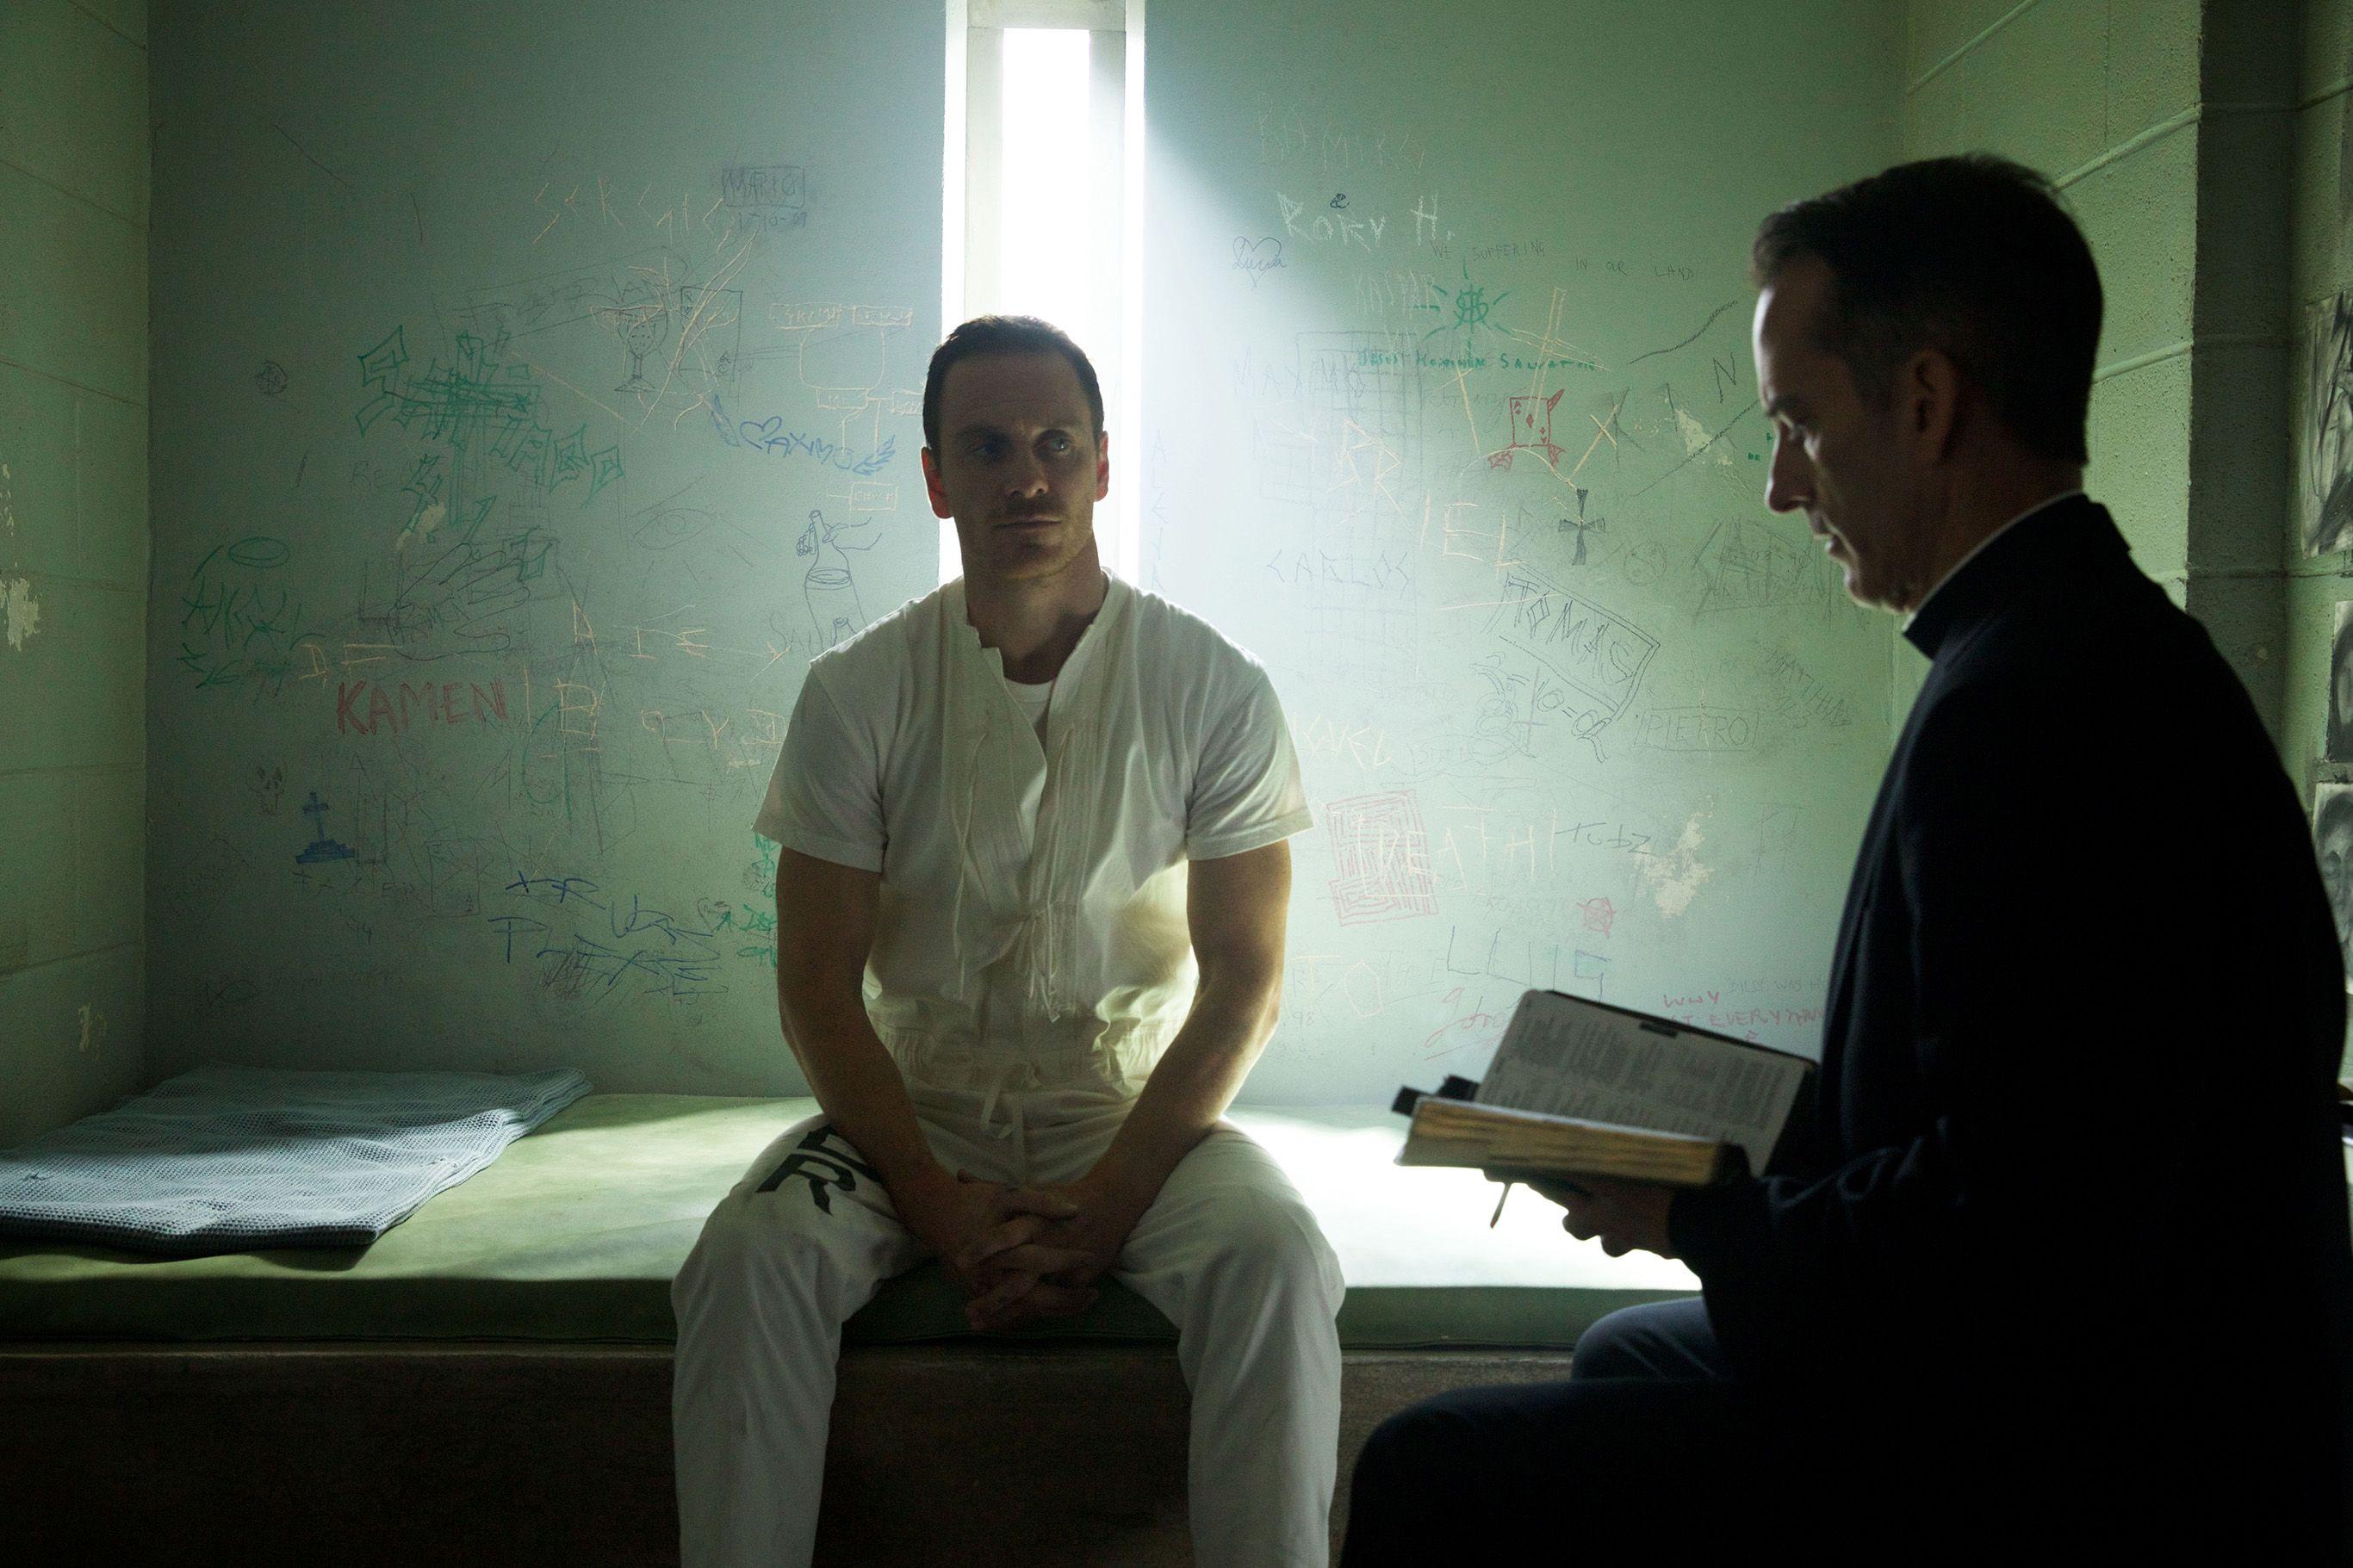 Assassin's Creed Movie: X-Men Magneto Michael Fassbender Behind Bars - http://www.morningledger.com/assassins-creed-movie-x-men-magneto-michael-fassbender-behind-bars/1361606/